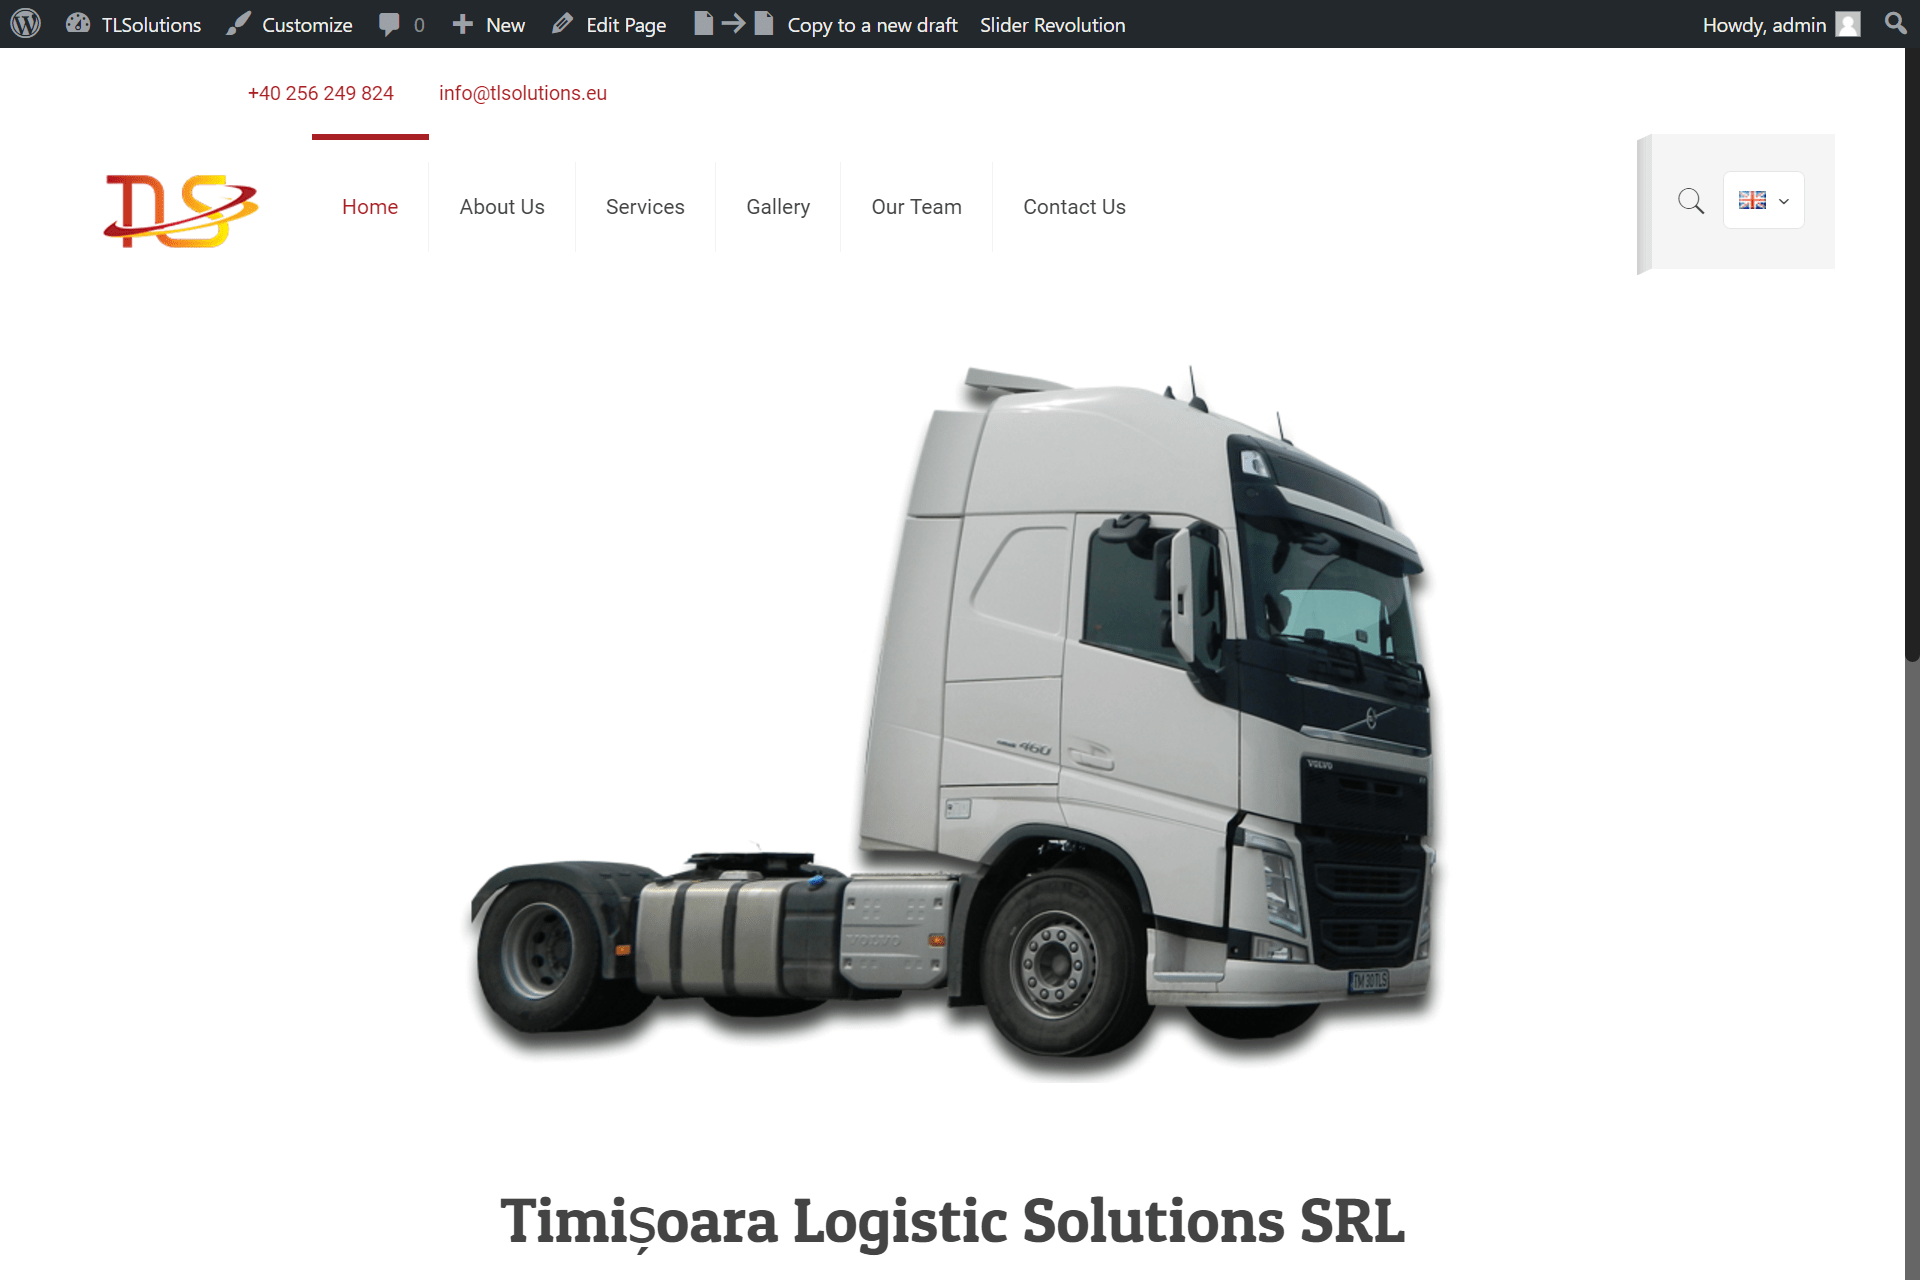 Web Design Timisoara Logistic Solutions